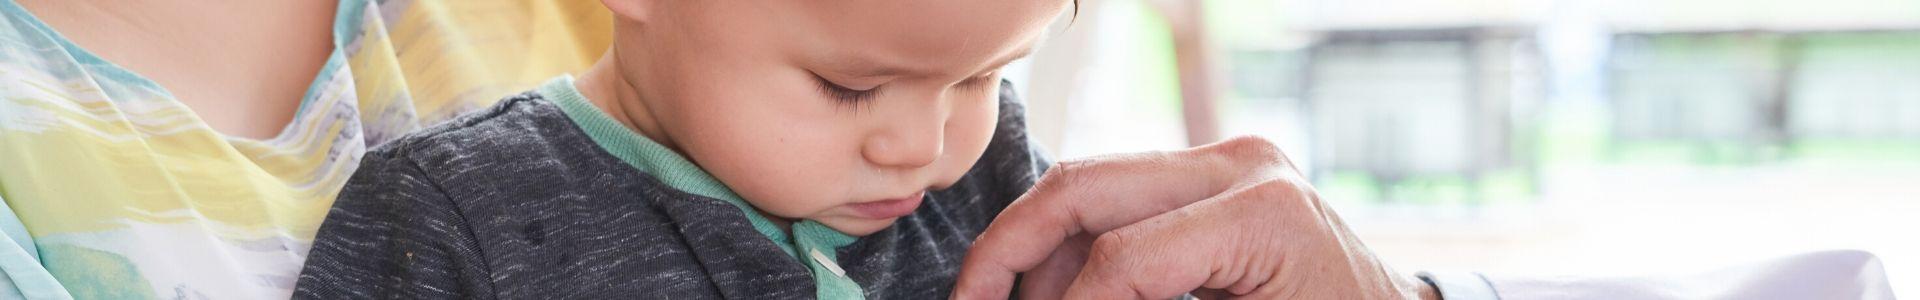 Medikamente Kinder Nebenwirkungen